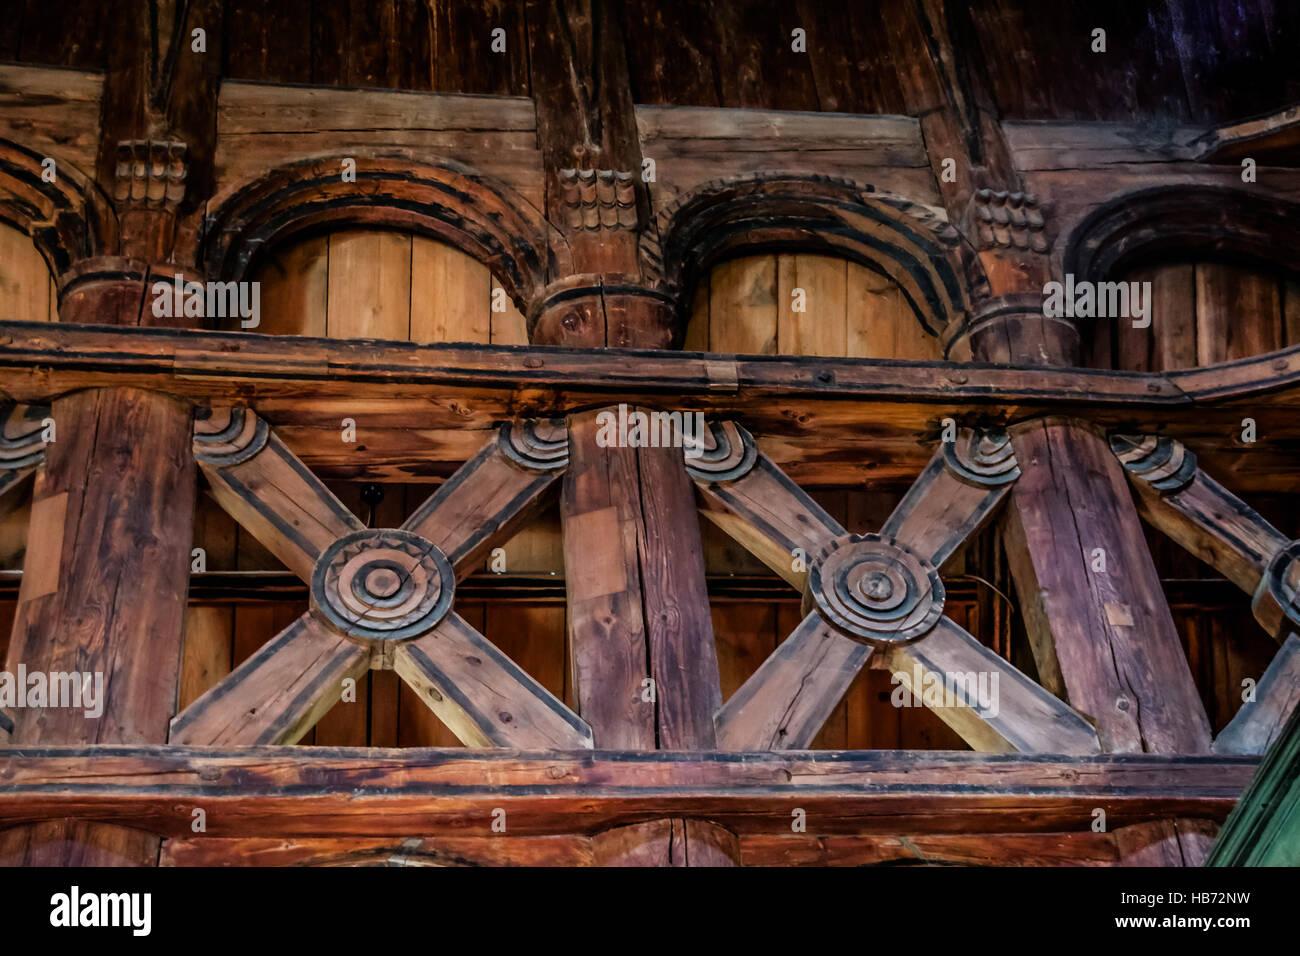 Kirche innenraum design daube stockfoto bild for Innenraum design